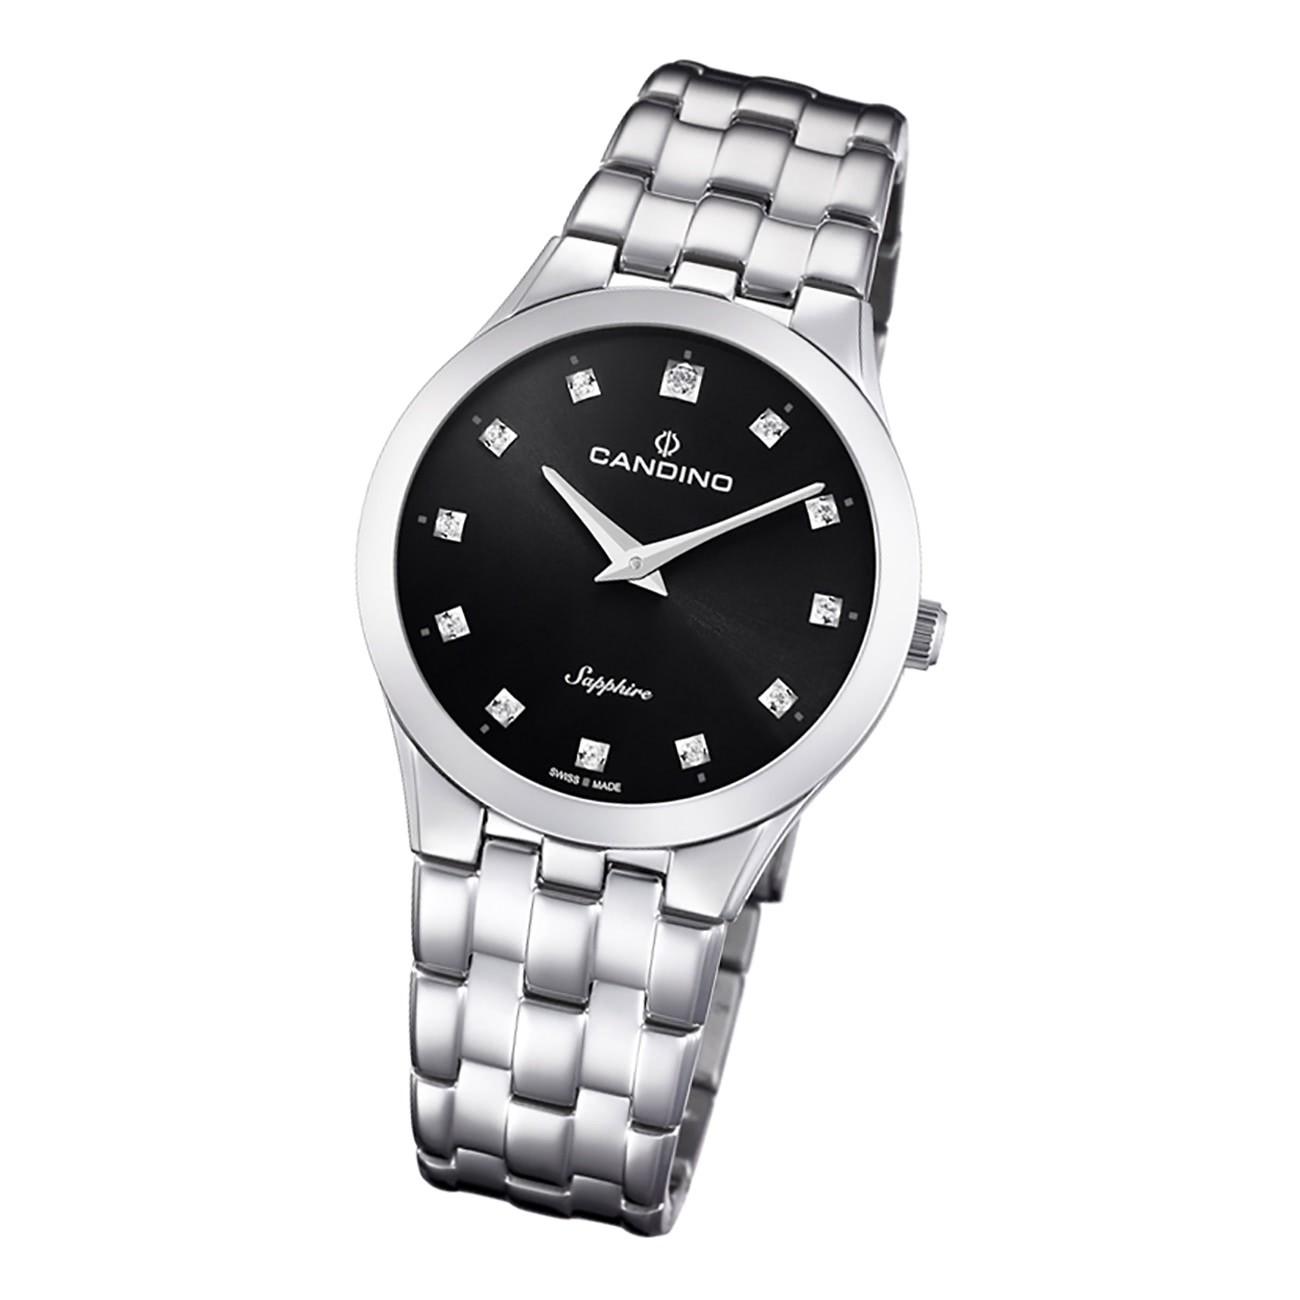 Candino Damen Armbanduhr Classic C4700/3 Analog Edelstahl silber UC4700/3